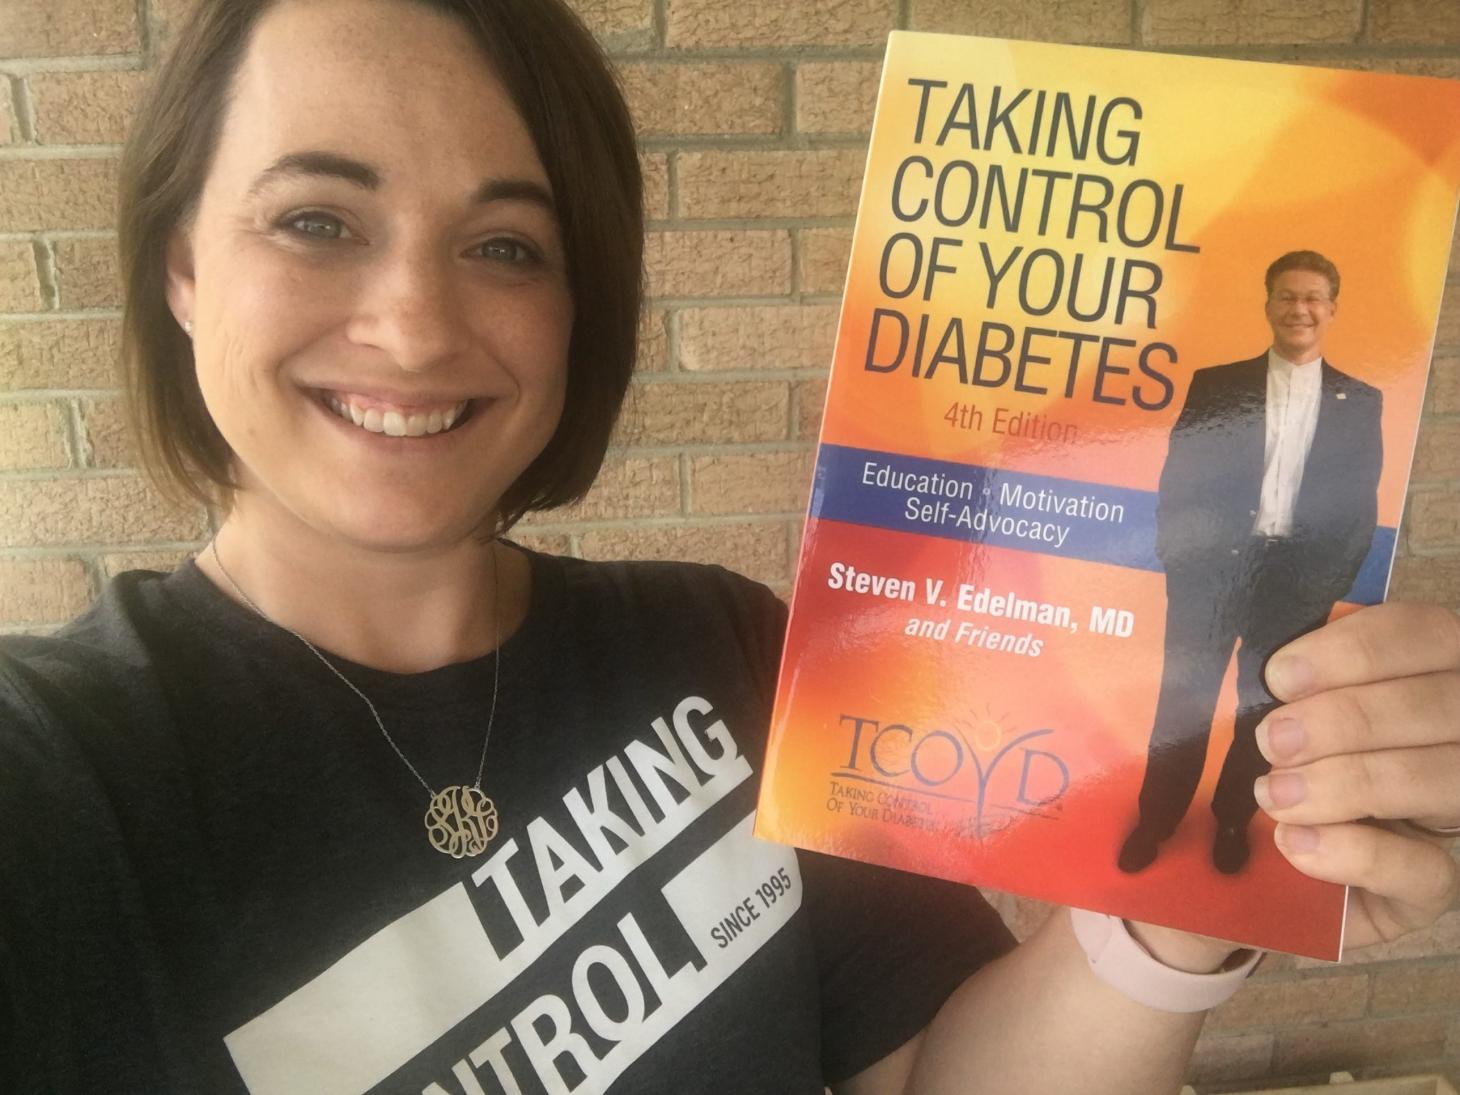 Sarah at TCOYD with Steve's book